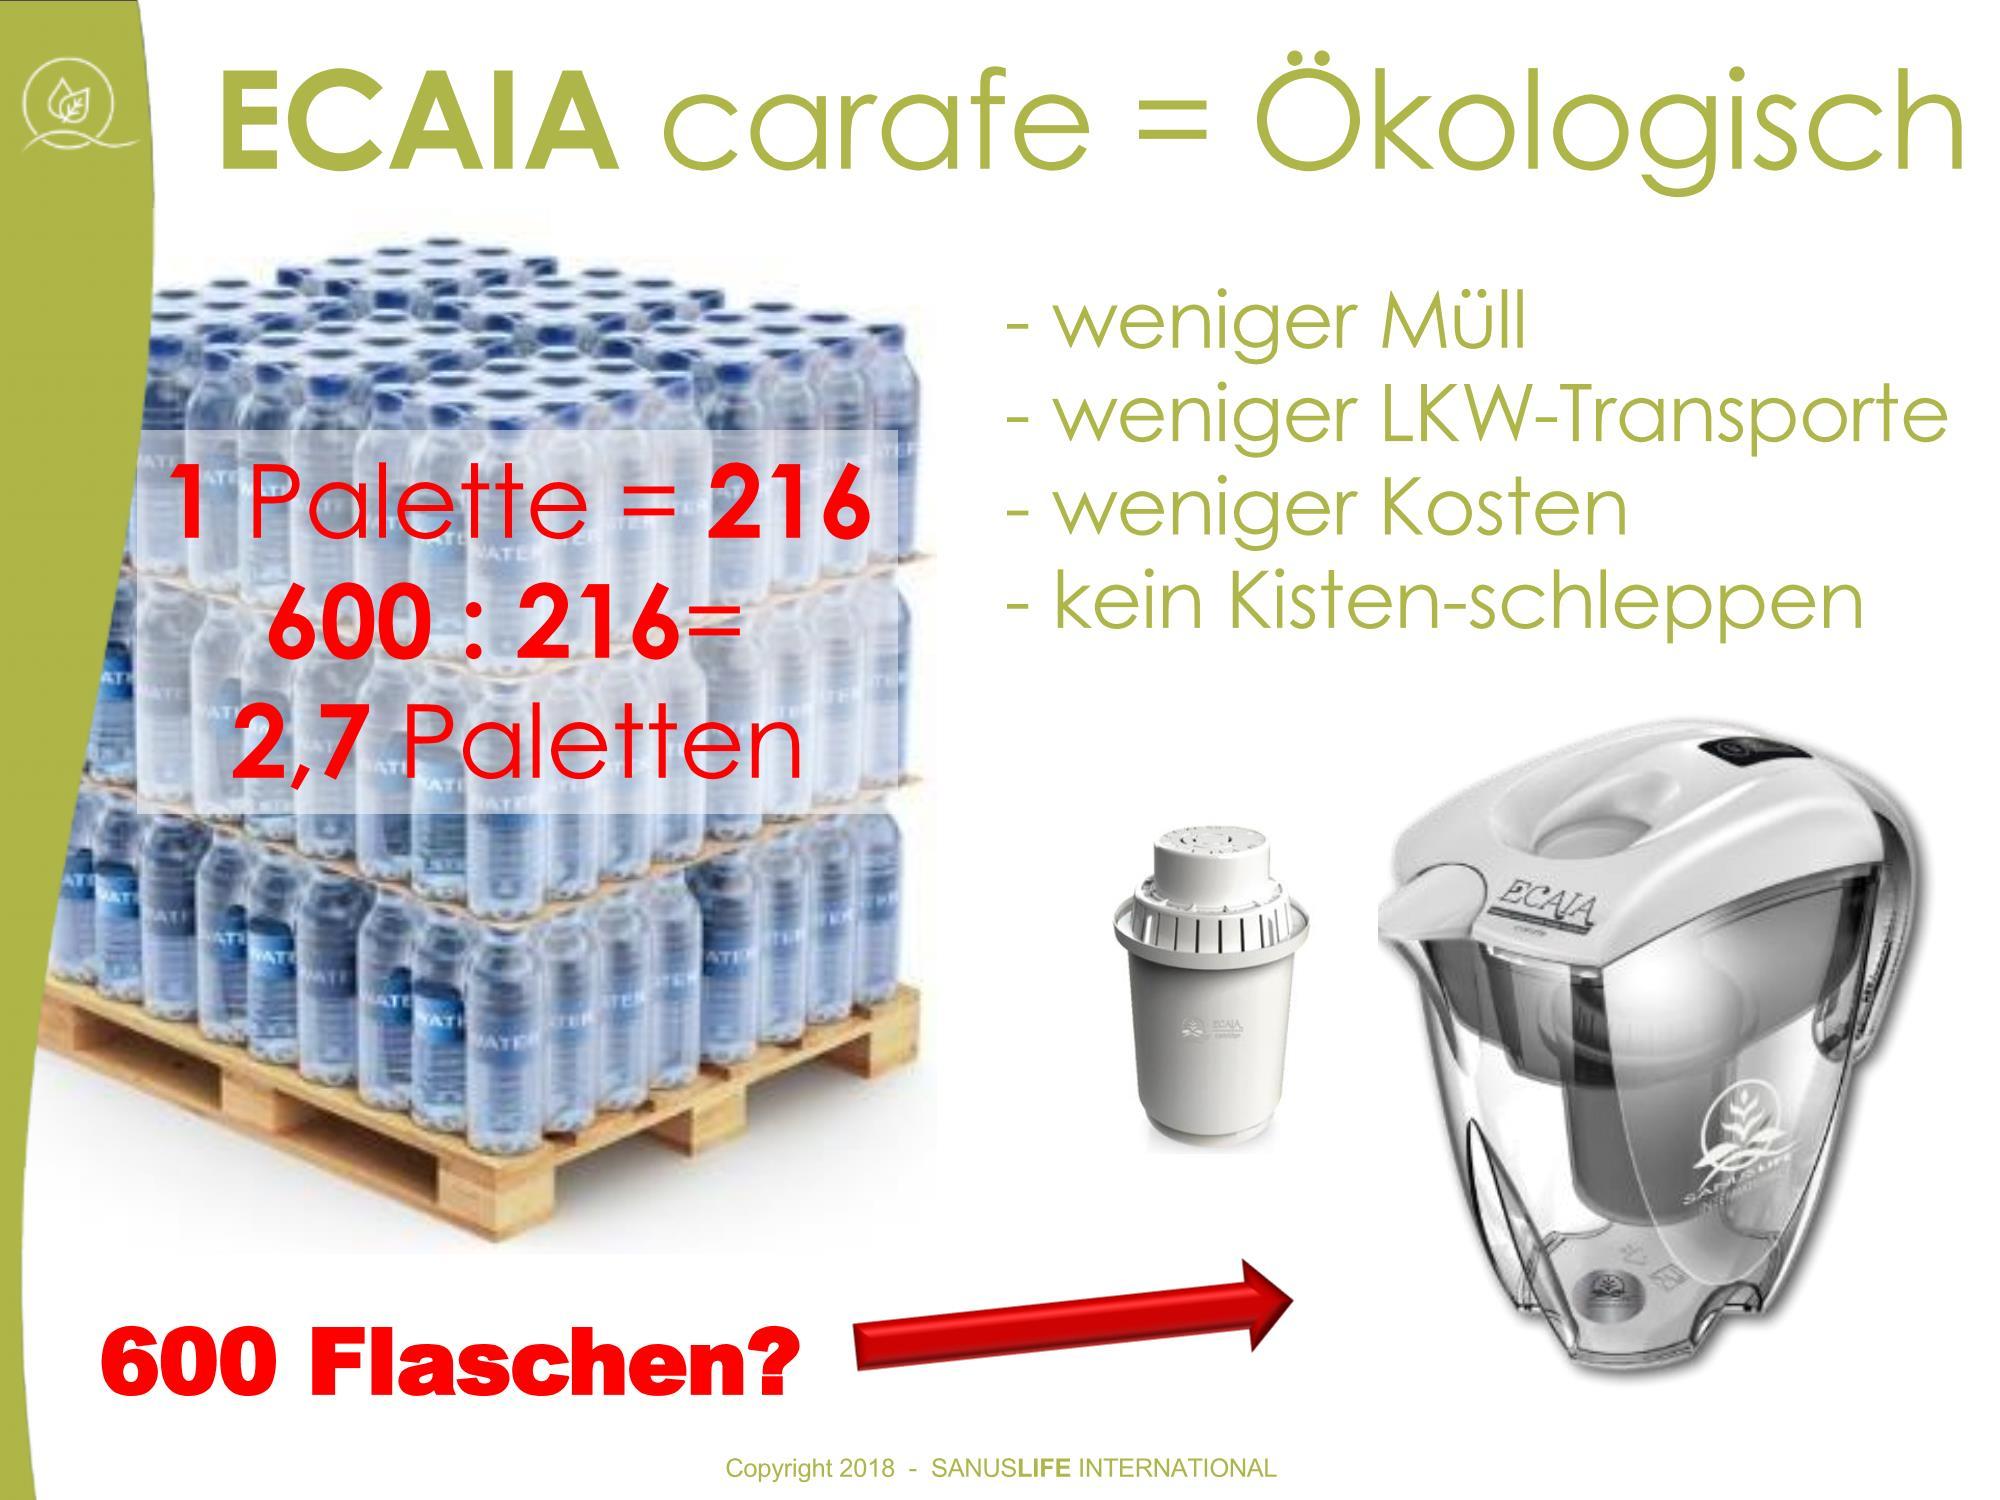 Bild Vergleich Ecaia - PET